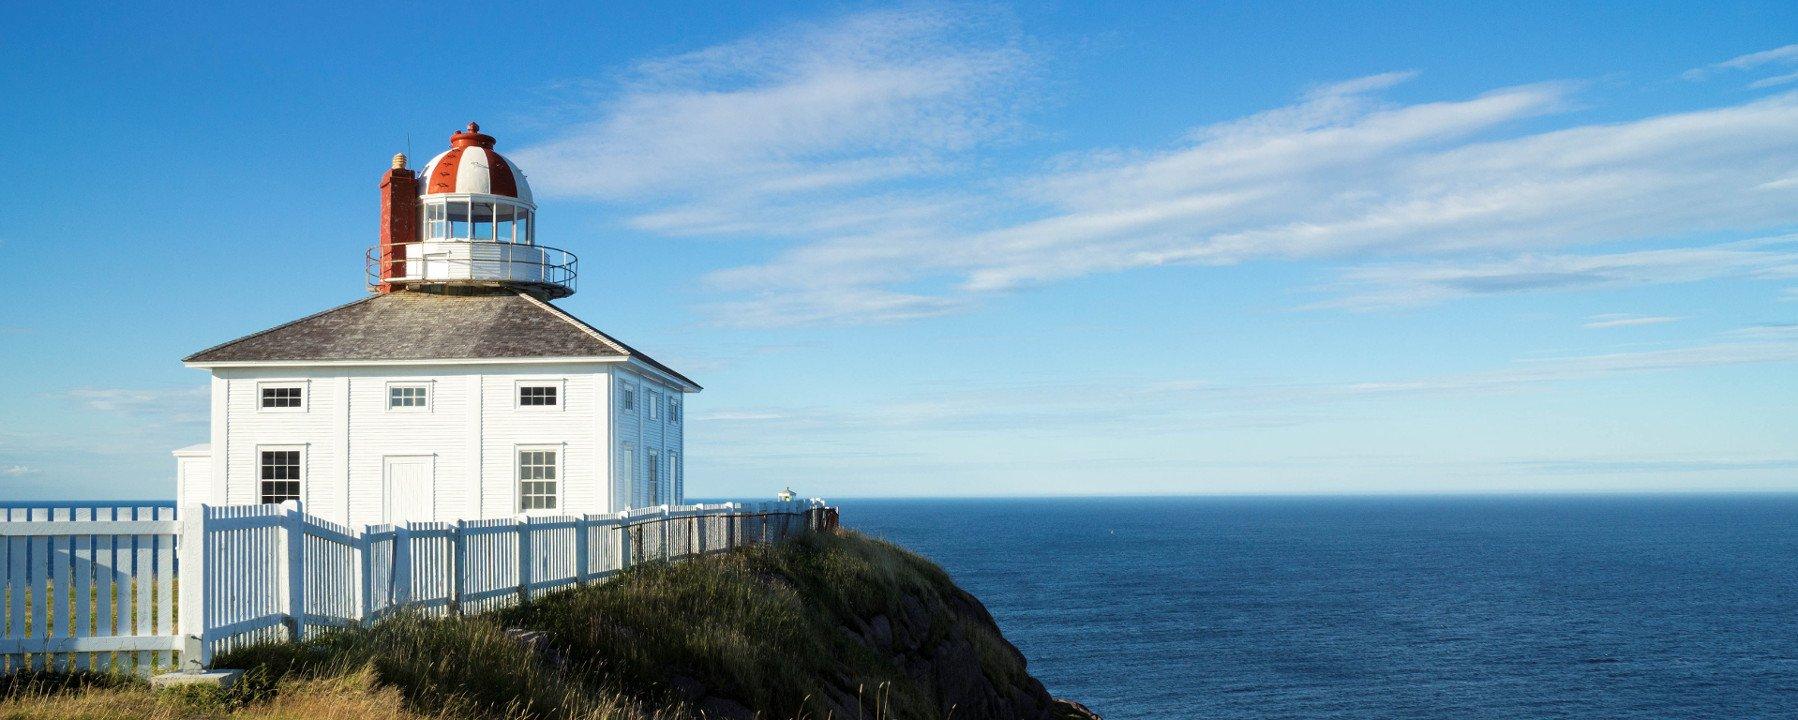 lighthouse-1920w-720h